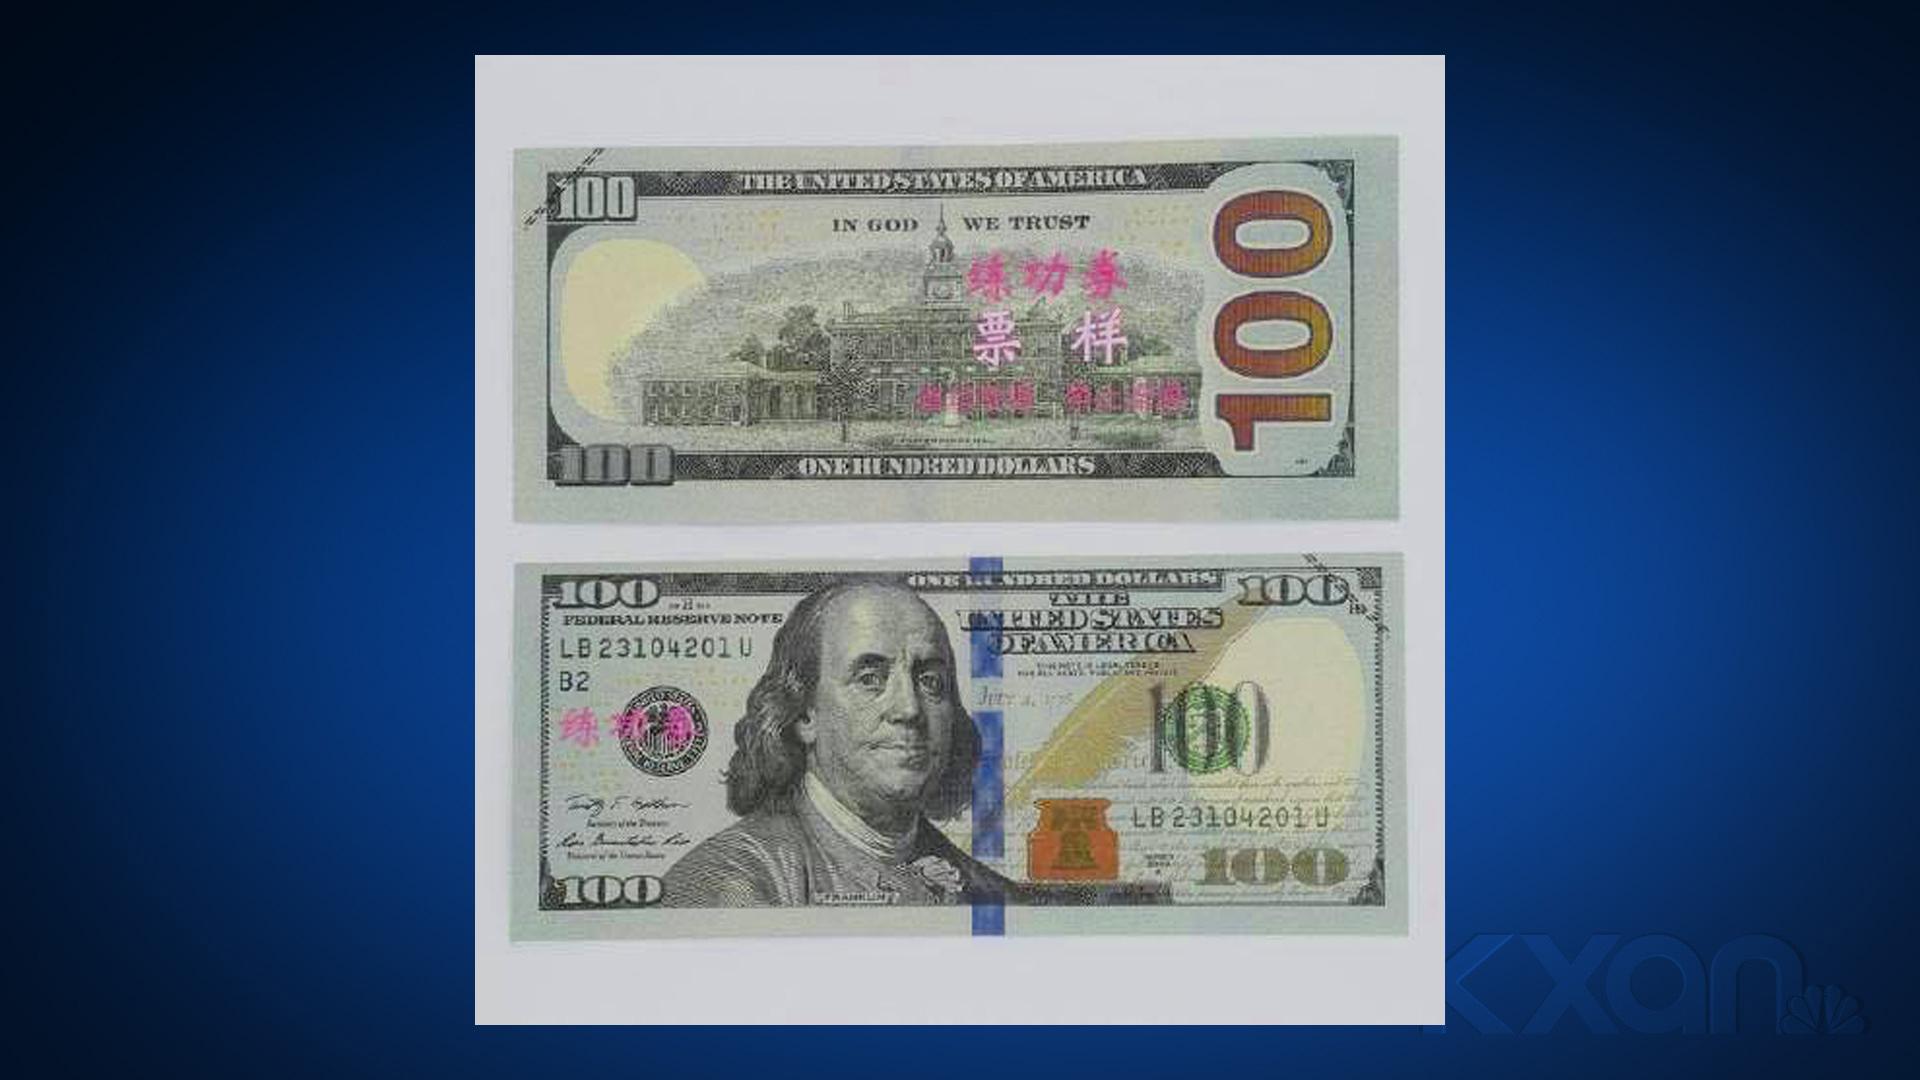 counterfit-bills_1556371724631.jpg